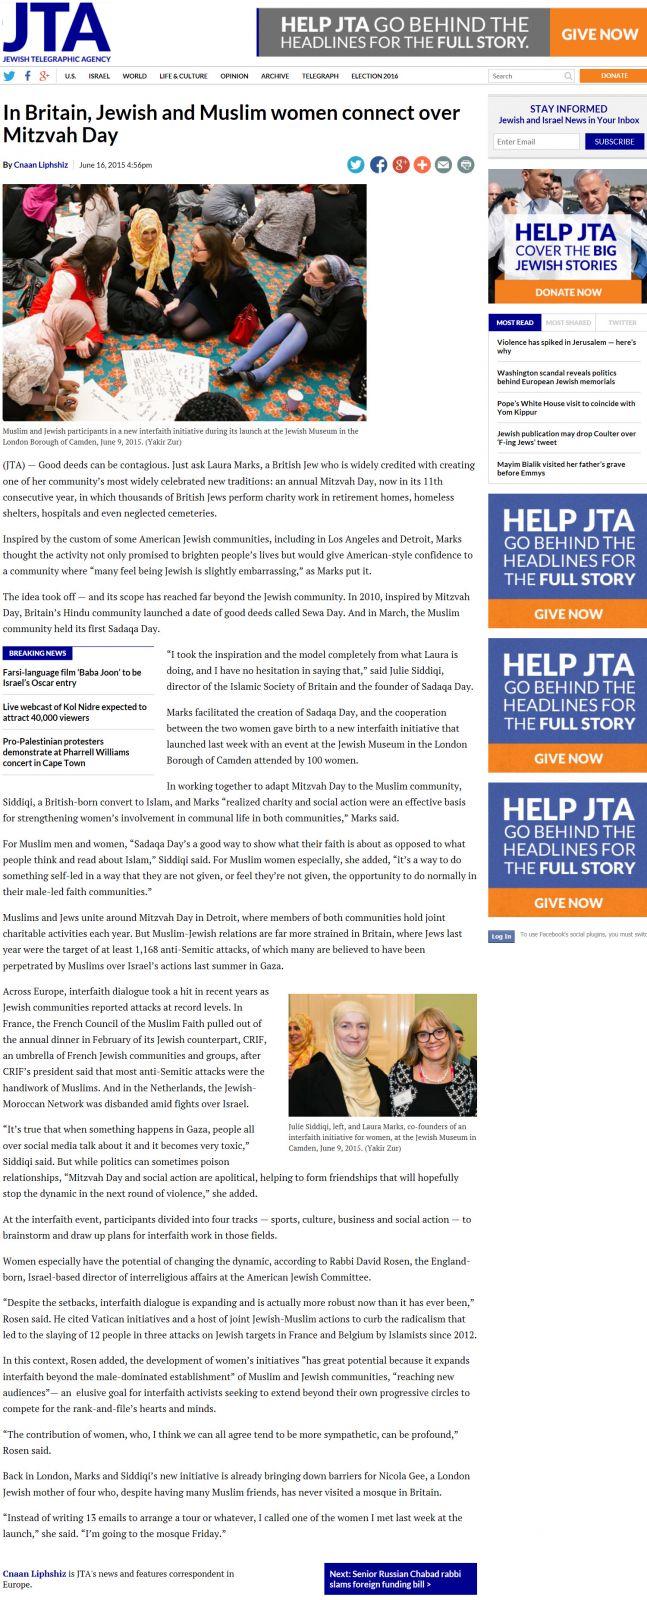 June 2015 - Mitzvah Day interfaith work on Jewish Telegraphic Agency